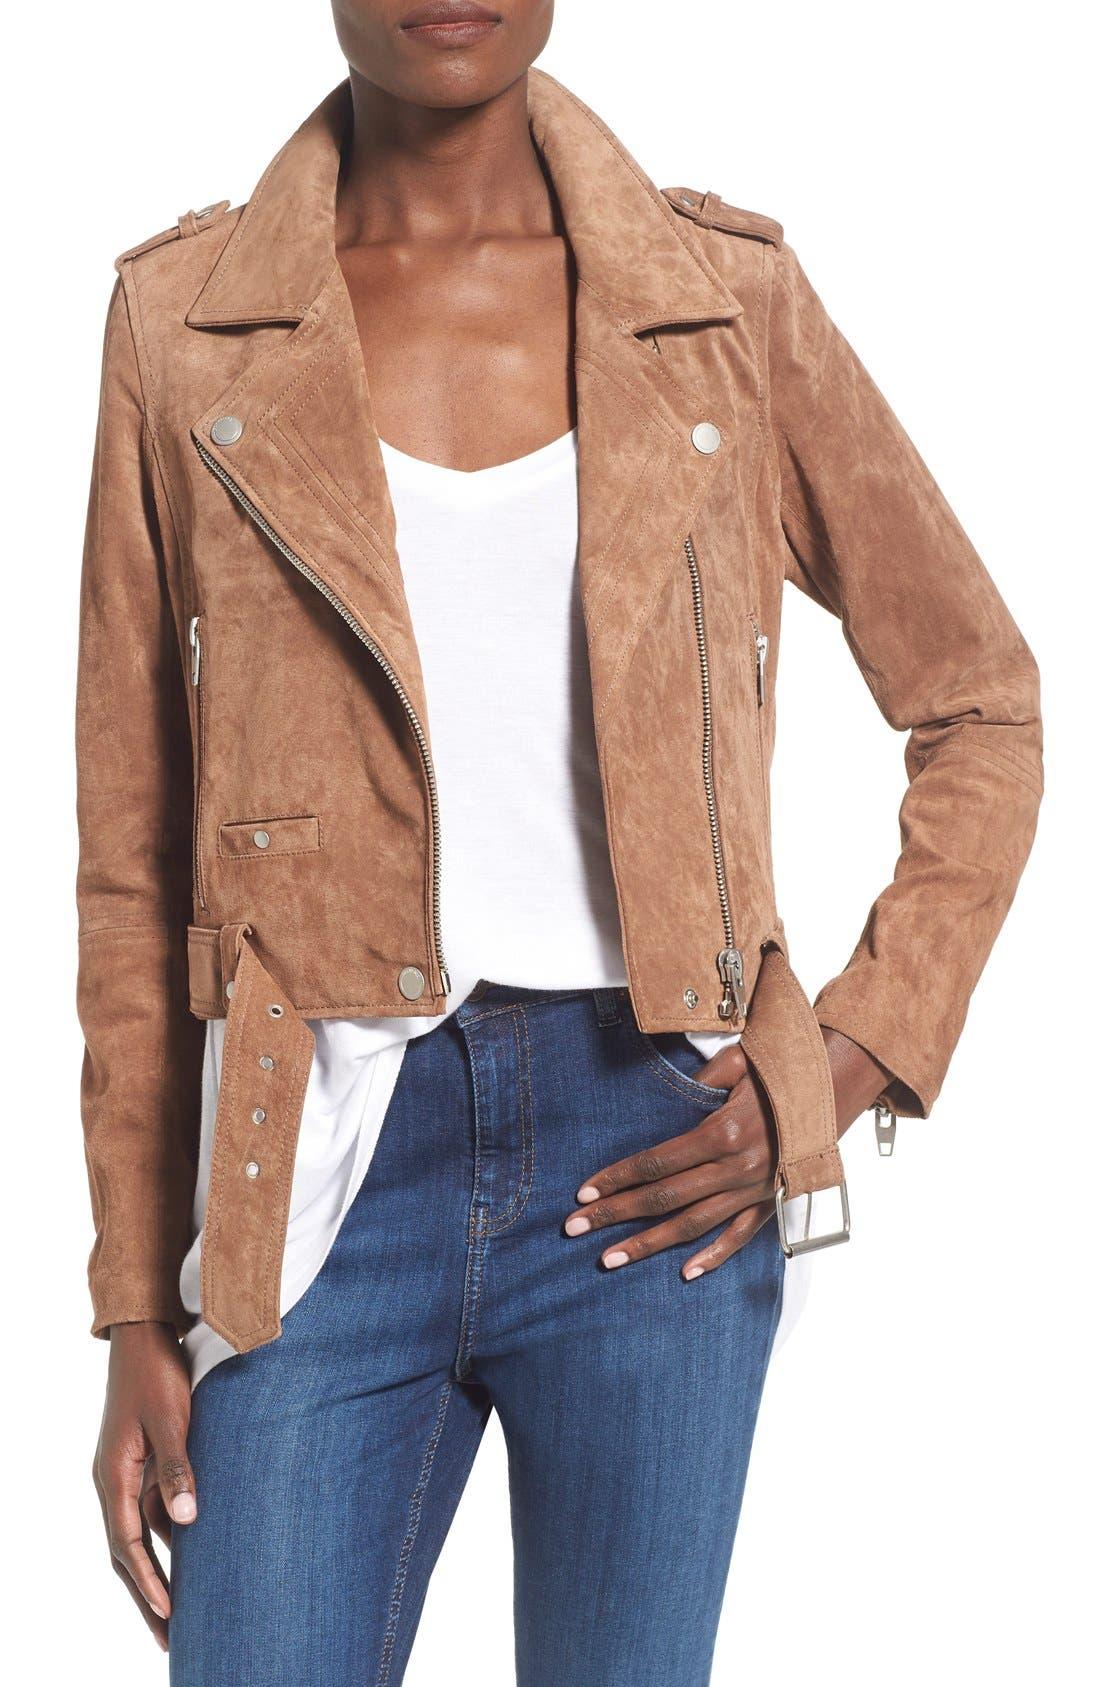 Leather jacket with roses - Leather Jacket With Roses 49